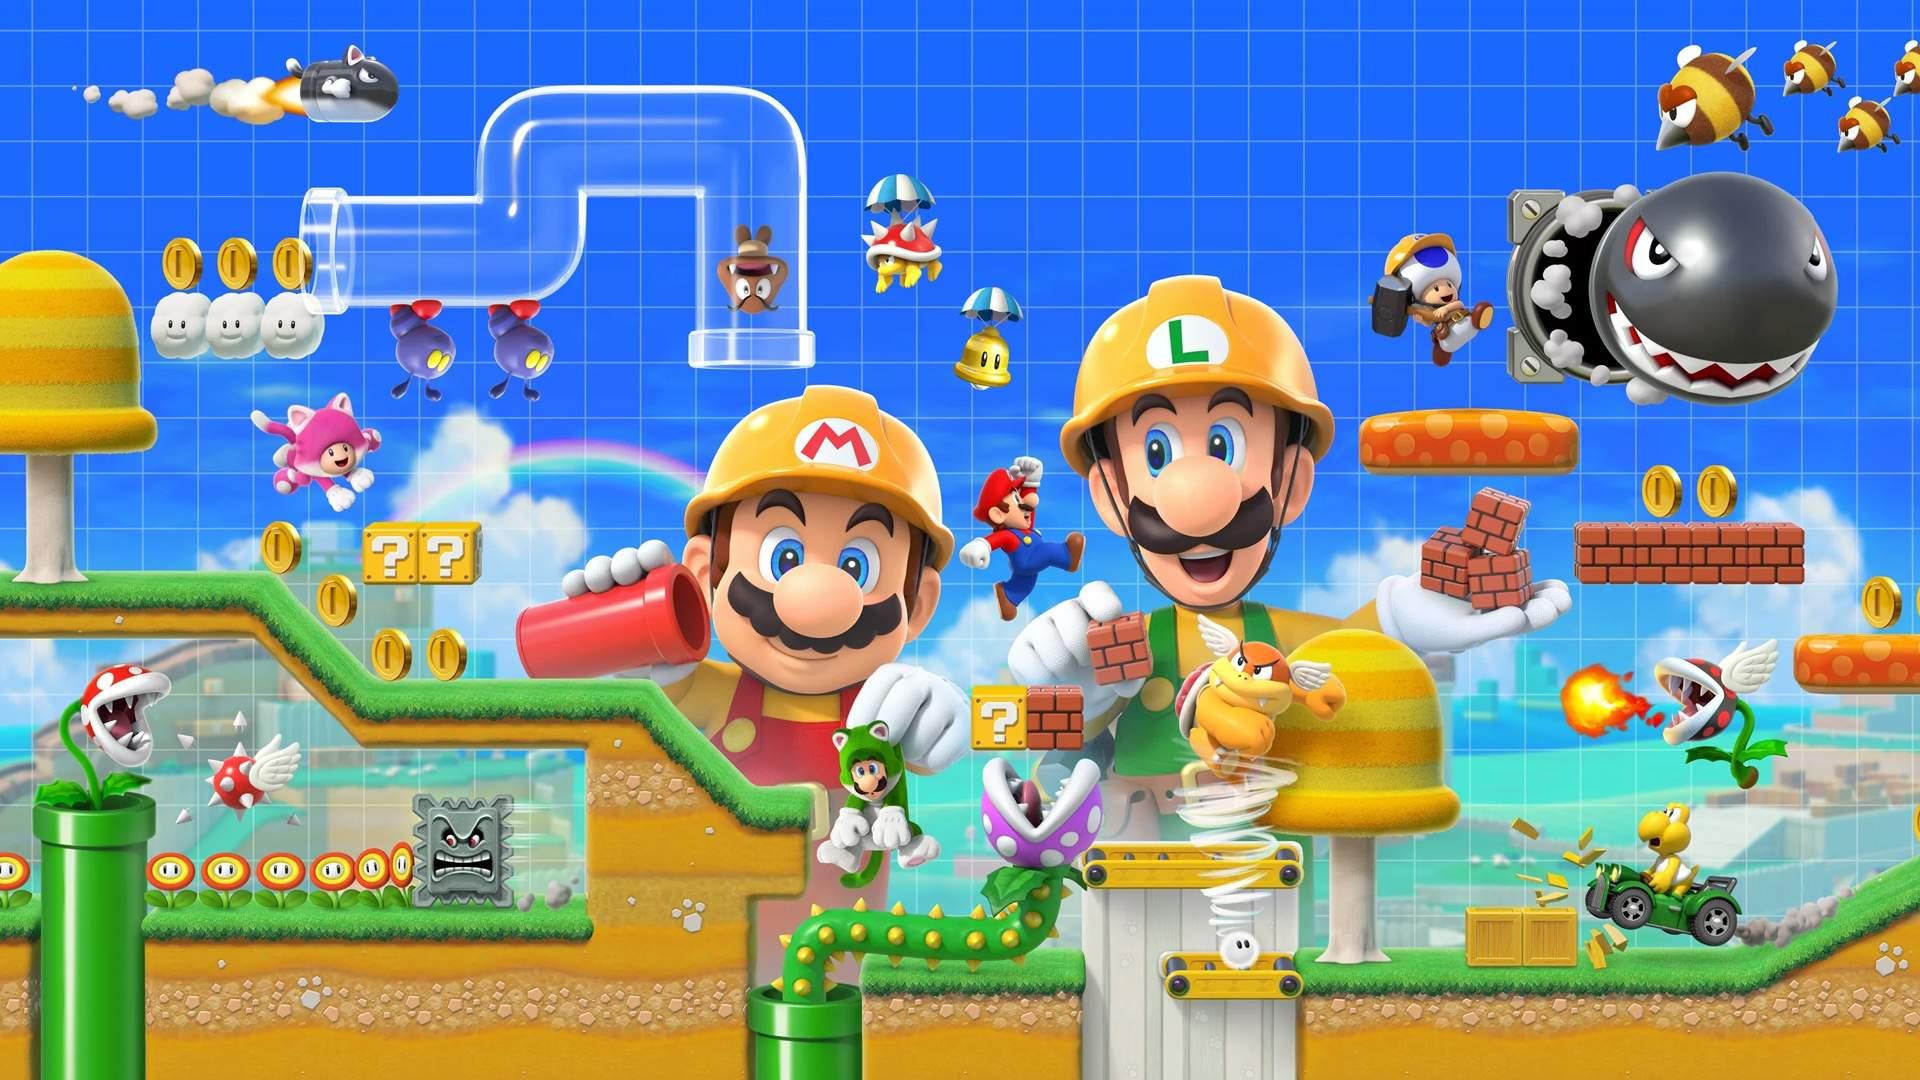 Nintendo Direct dévoile le gameplay de Super Mario Maker 2